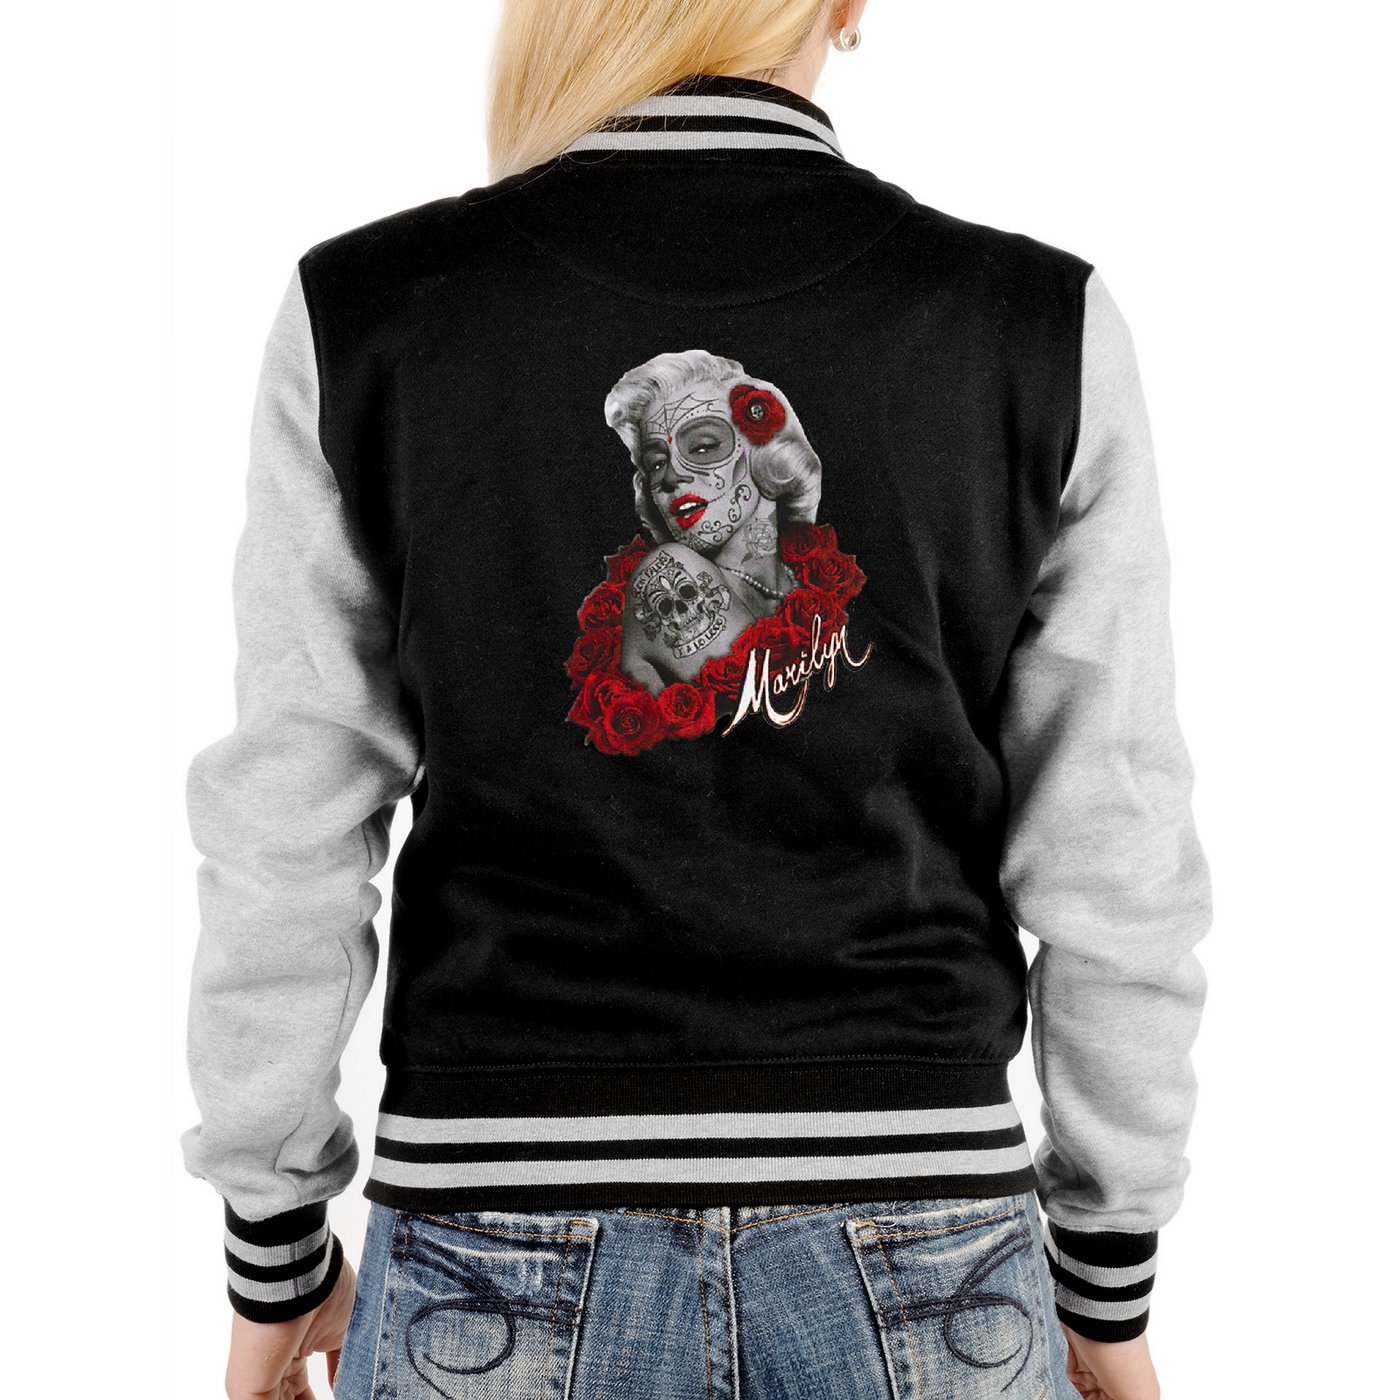 Herren College Jacke mit Gangster Marilyn Monroe Motiv